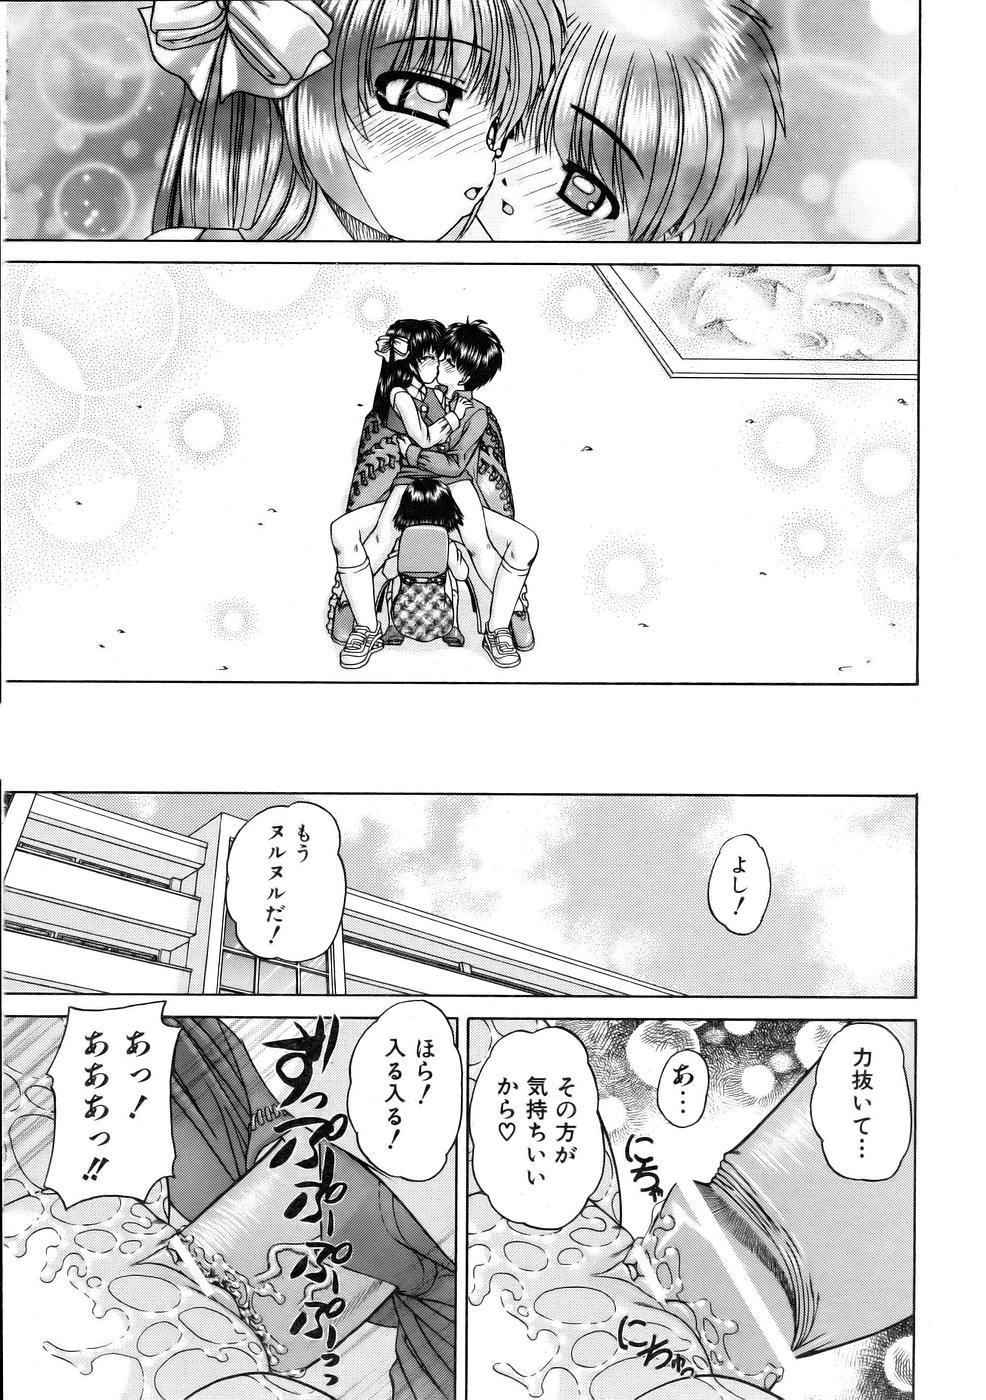 COMIC AUN 2005-10 Vol. 113 298